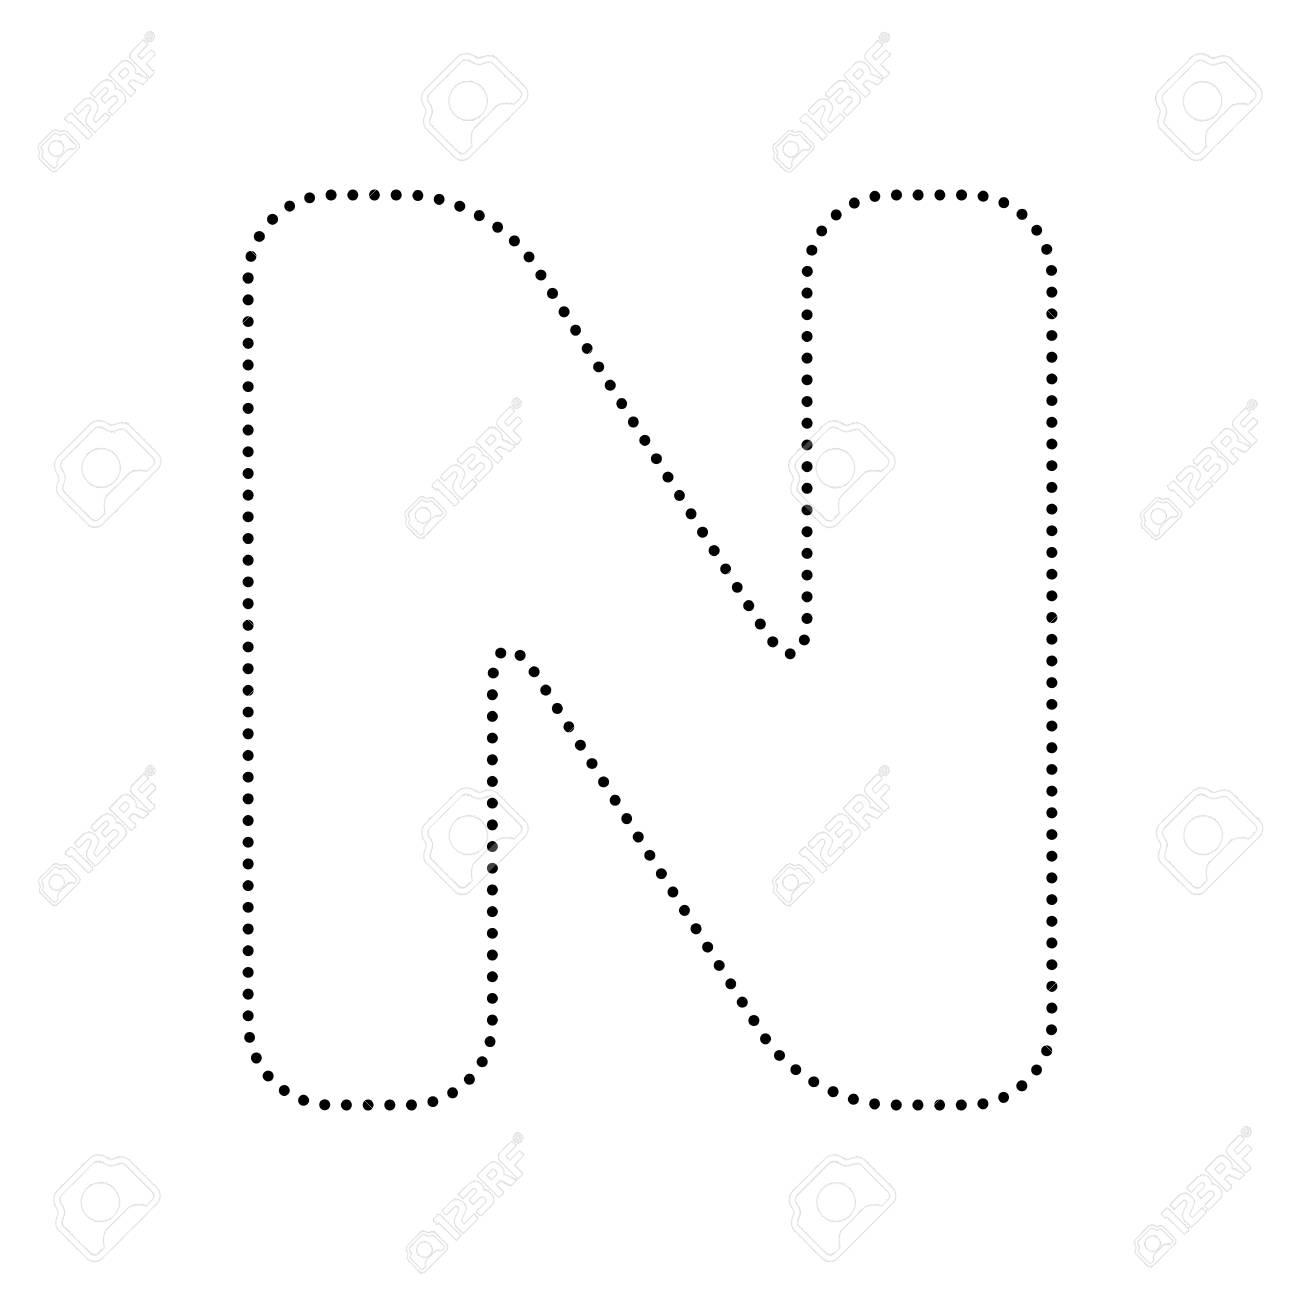 Letter n sign design template element vector black dotted icon letter n sign design template element vector black dotted icon on white background maxwellsz